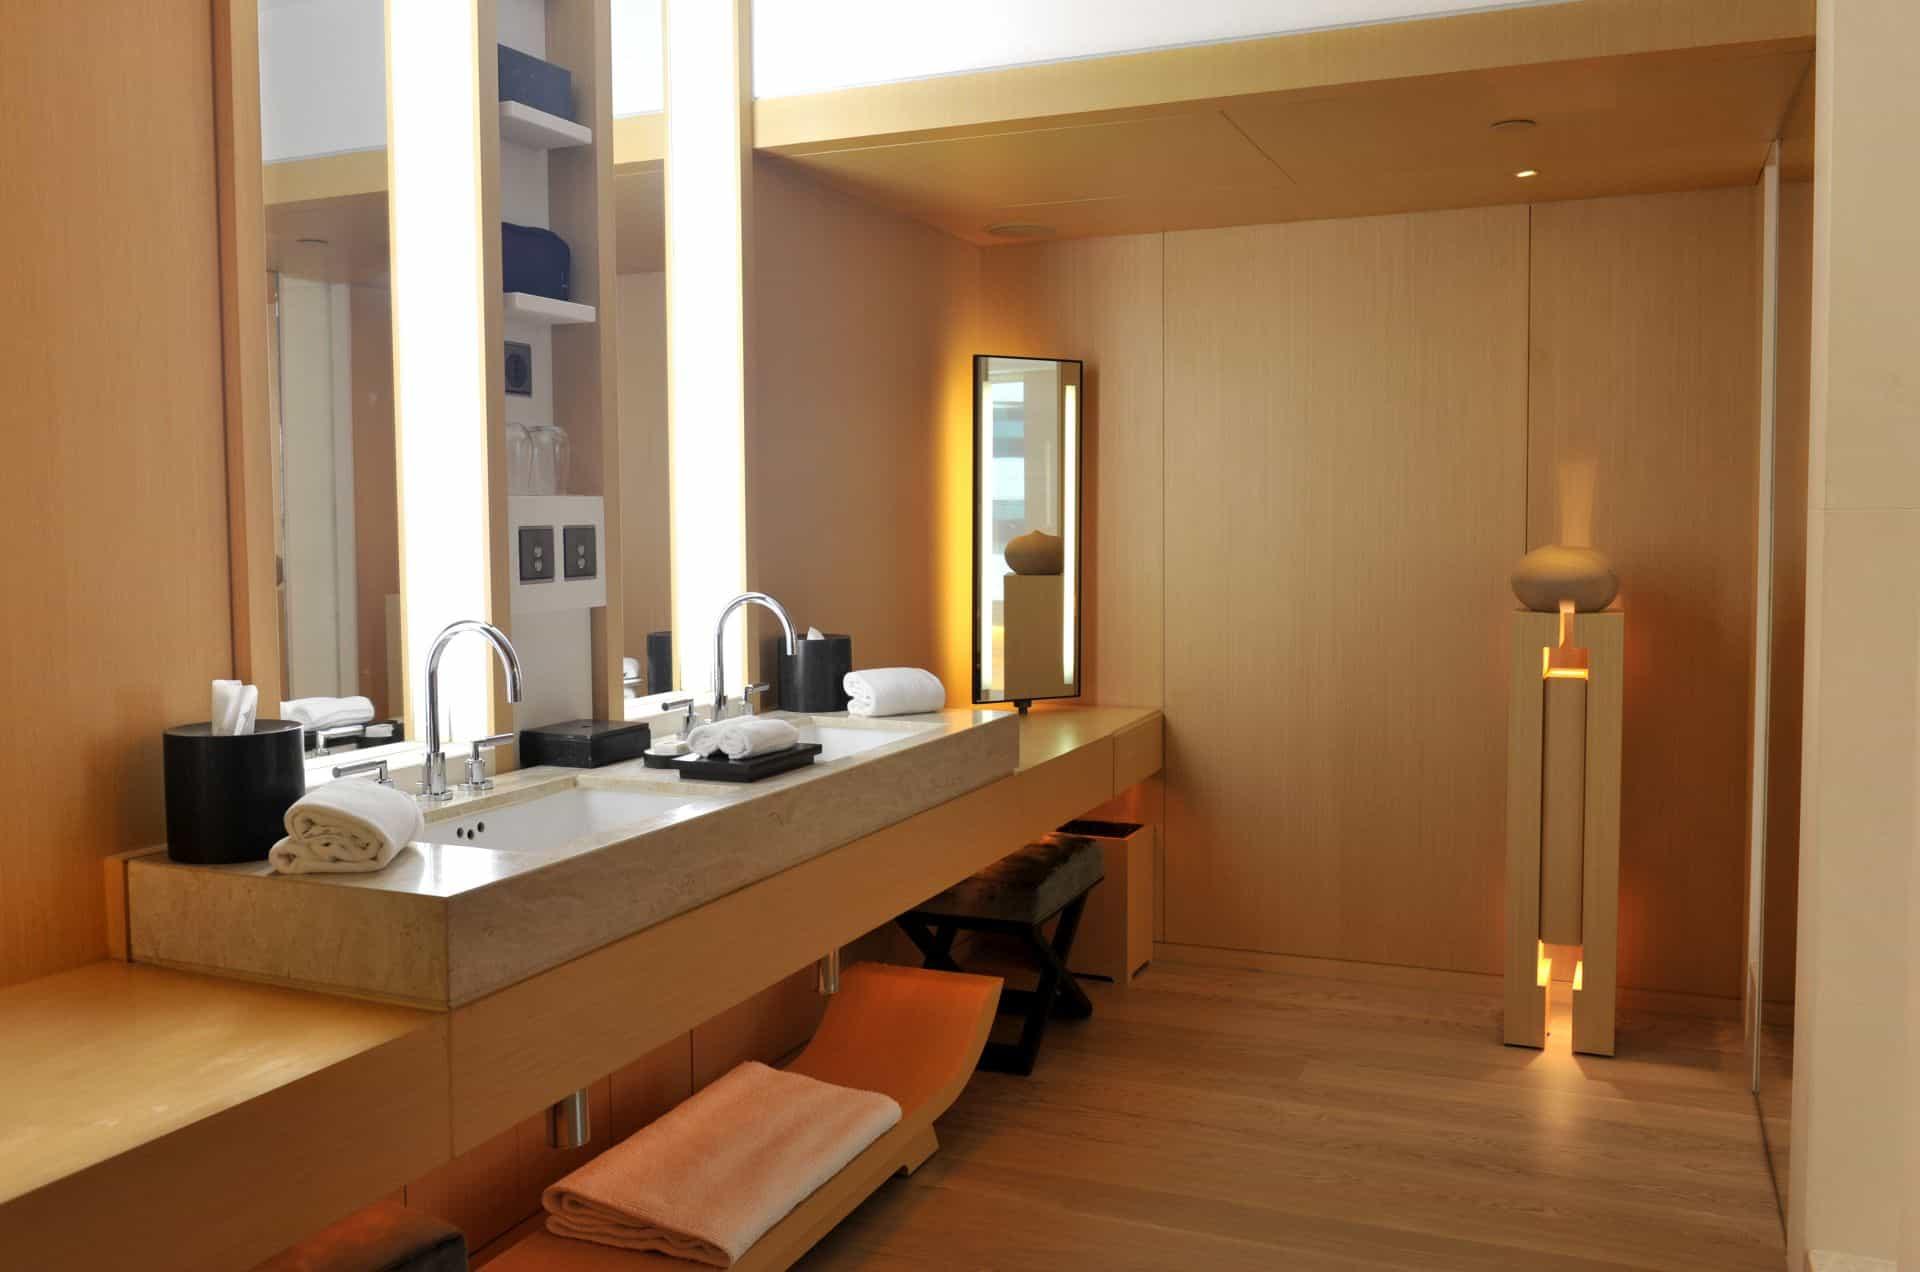 The Upper House bathroom